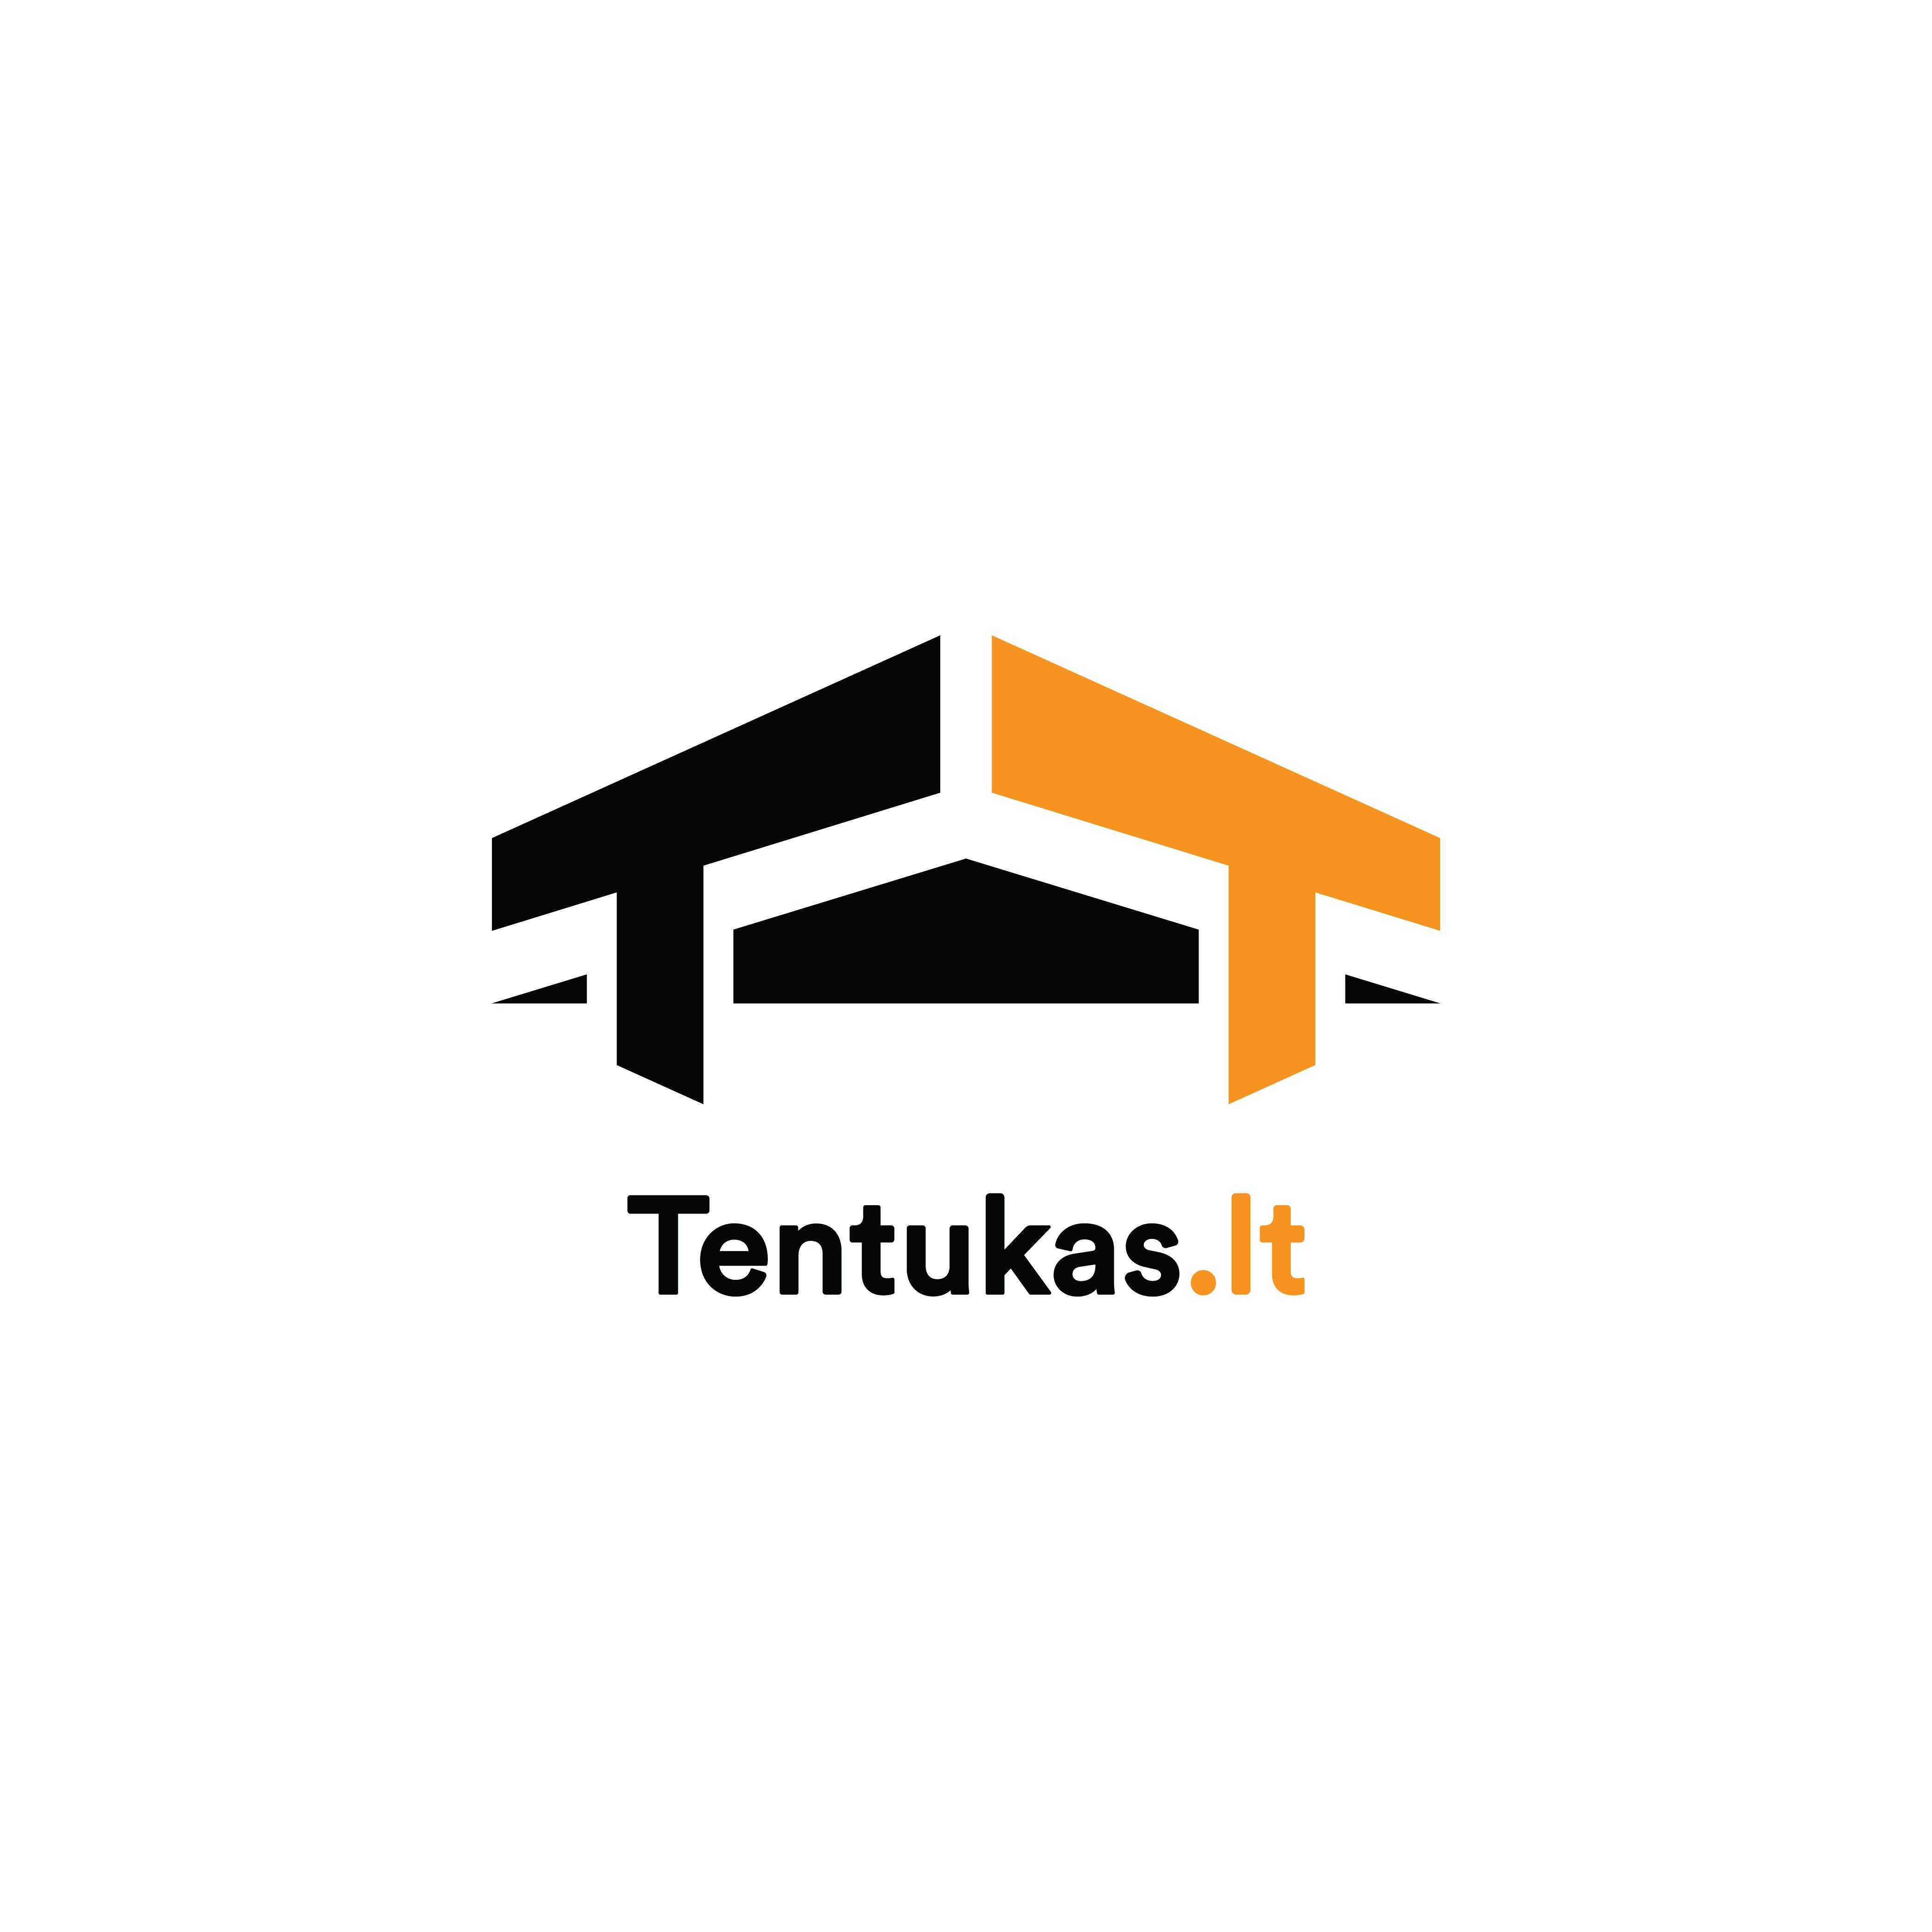 www.tentukas.lt